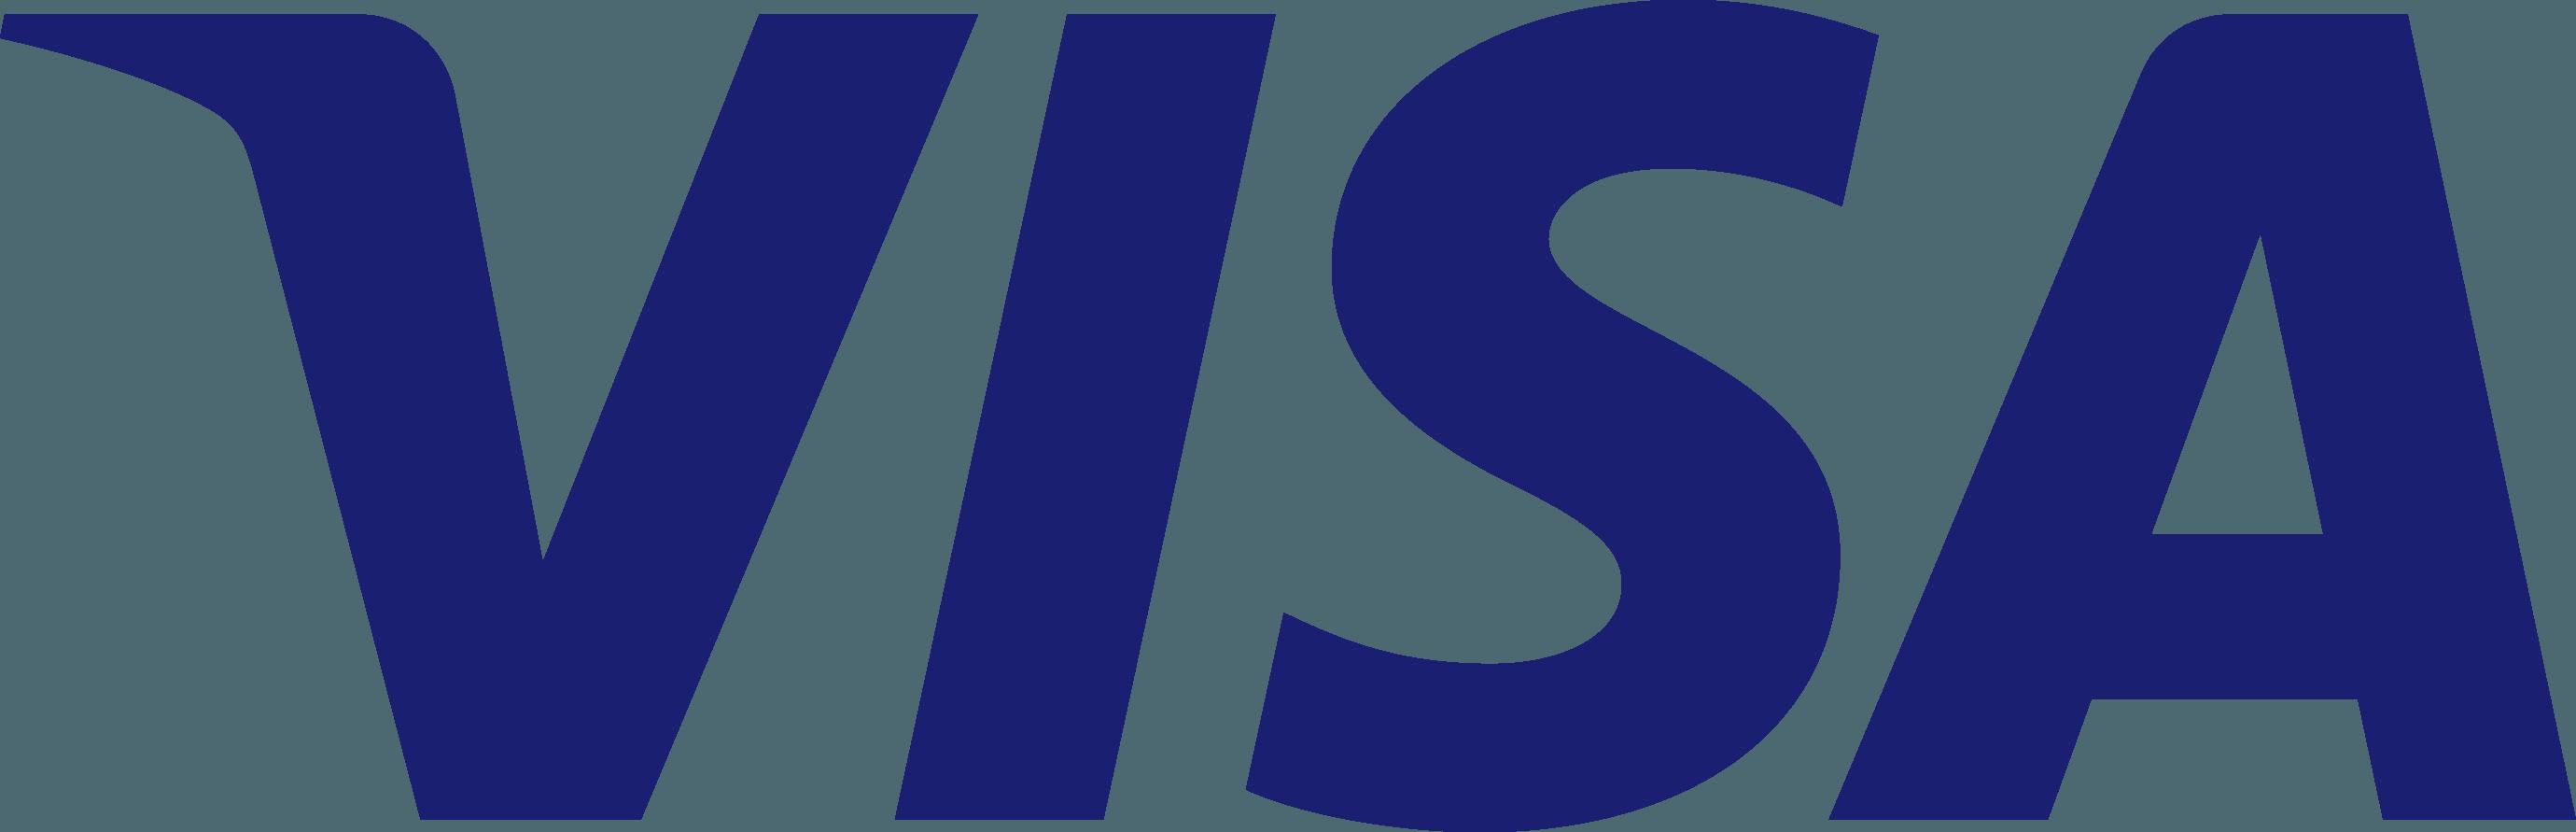 Visa Card Logo png